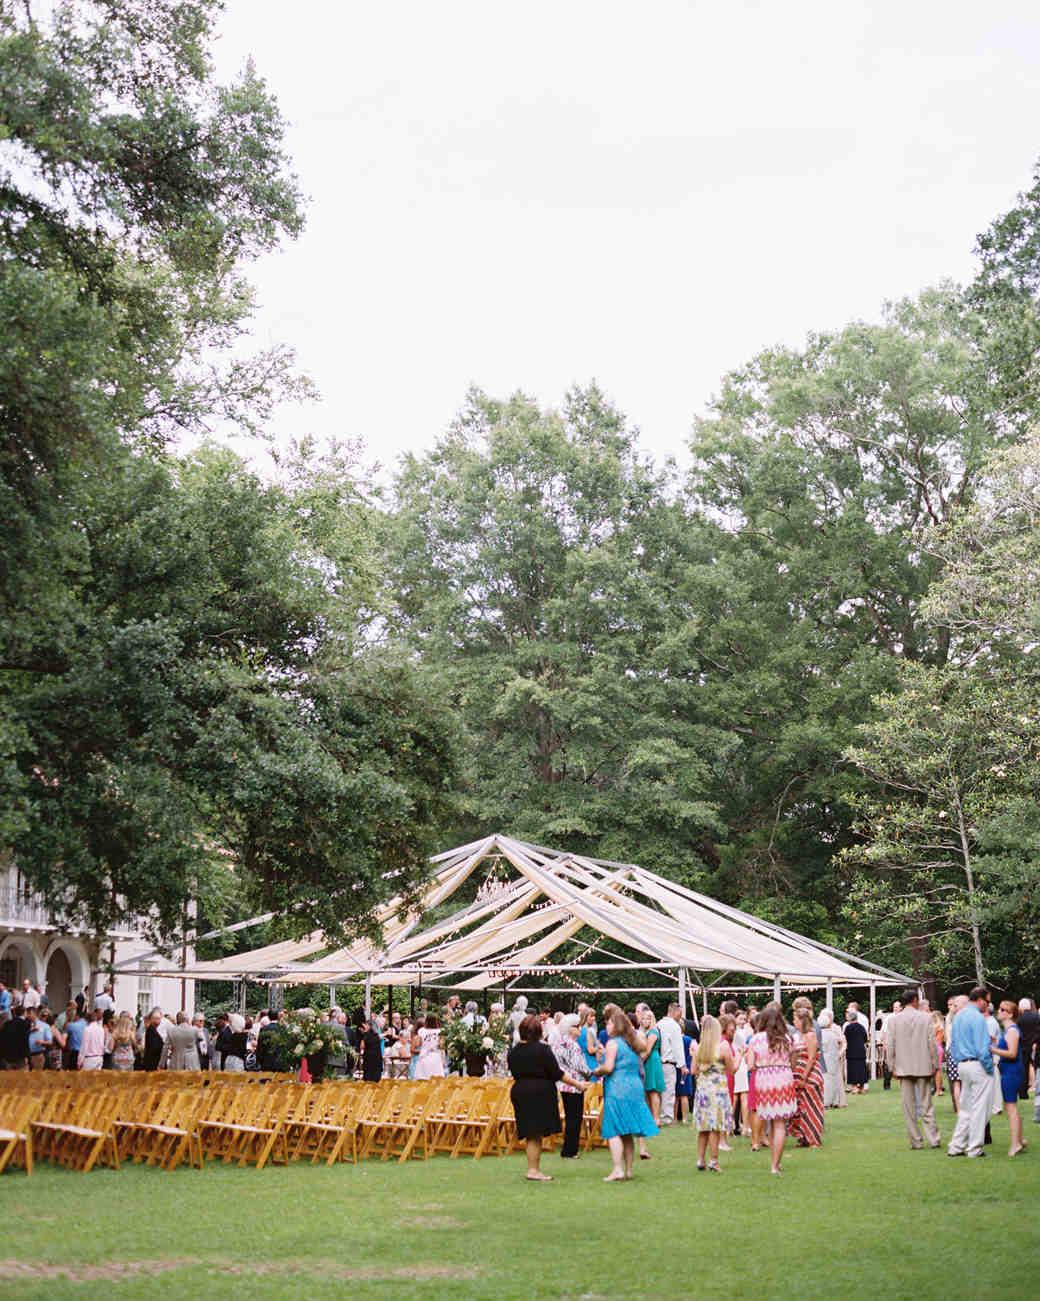 irby-adam-wedding-cocktailhour-229-s111660-1014.jpg